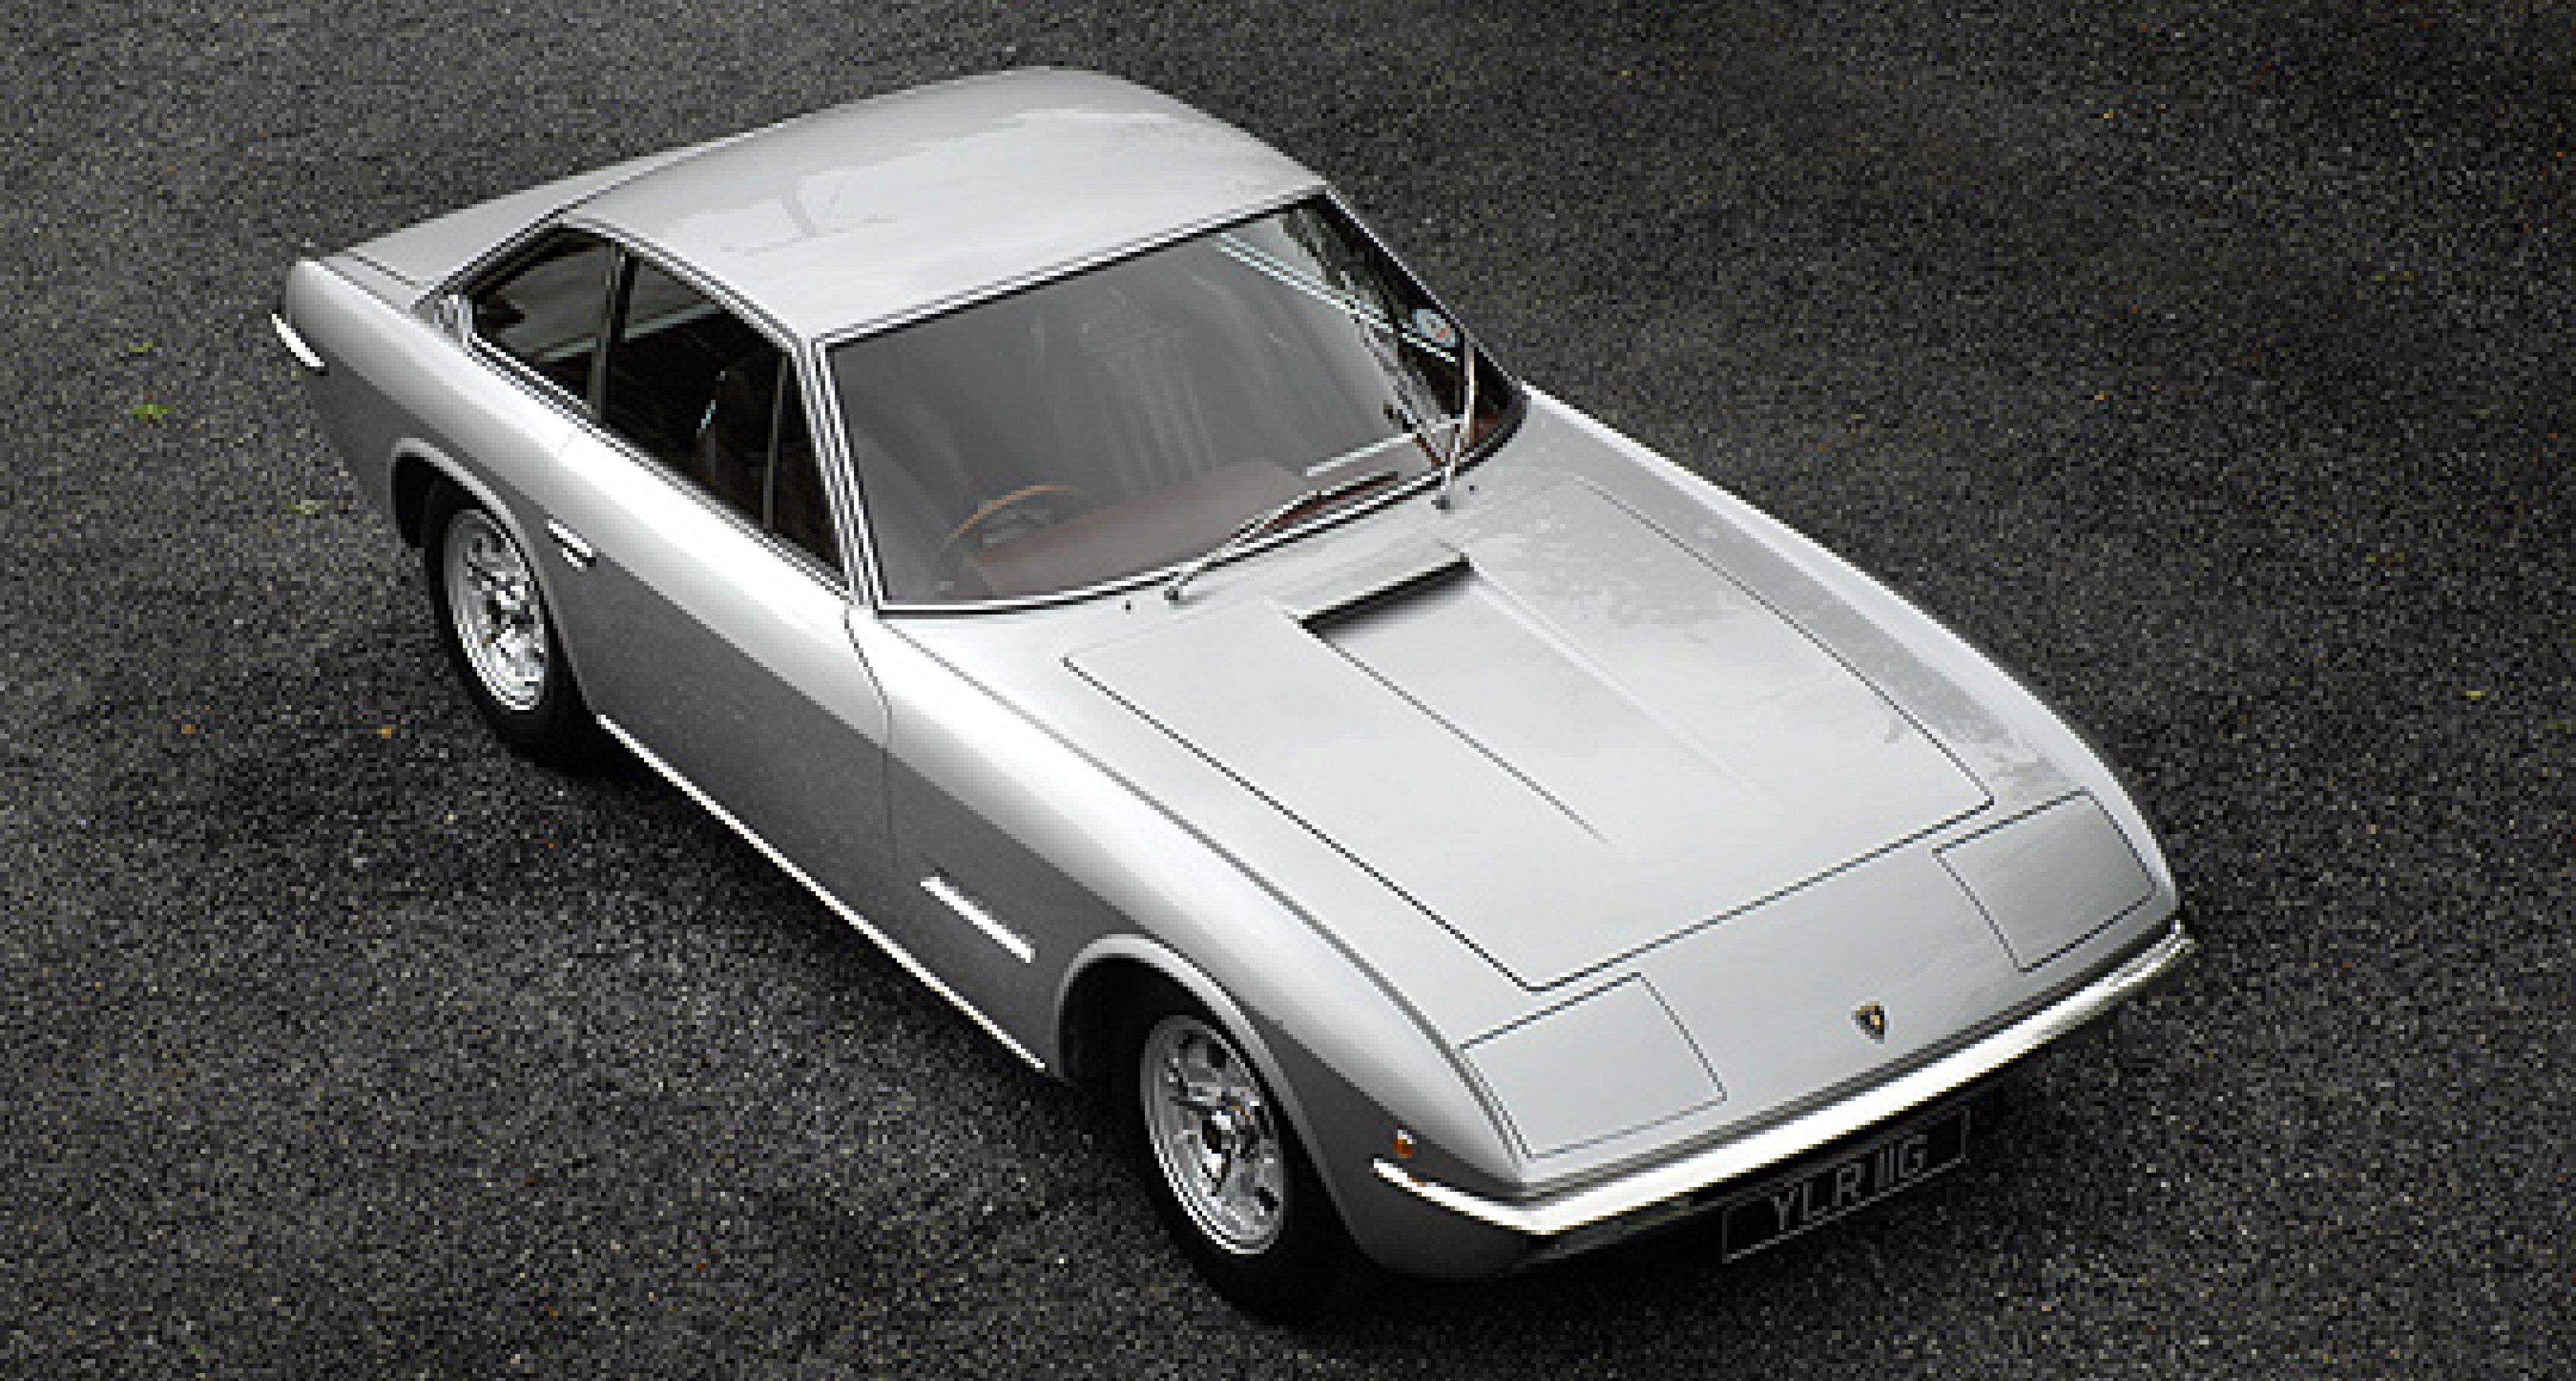 RM versteigert Roger Moores Lamborghini Islero in London